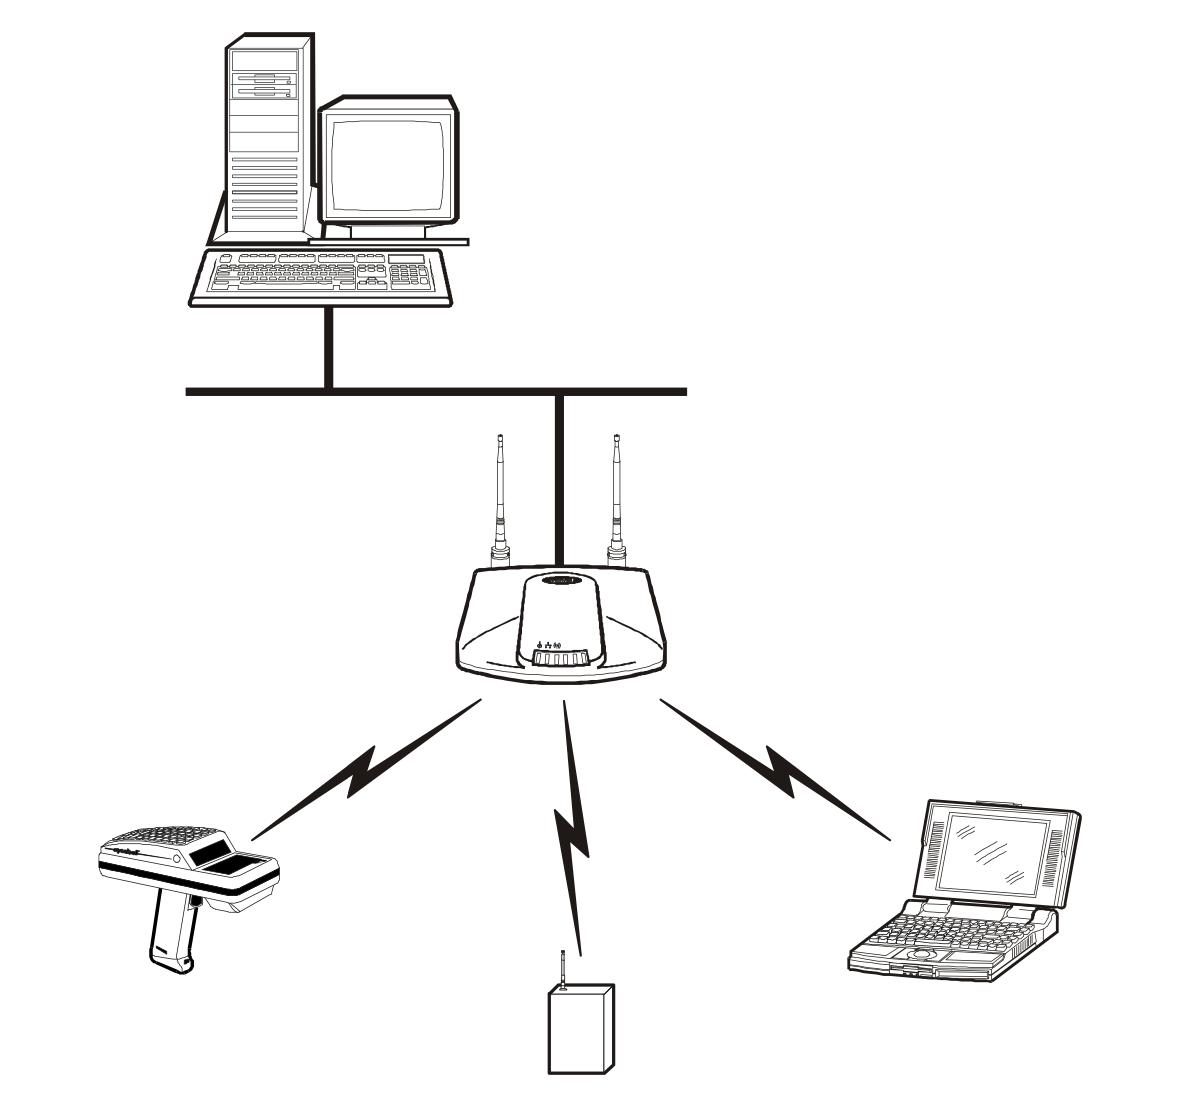 bulky desktop, laptop and handheld scanner